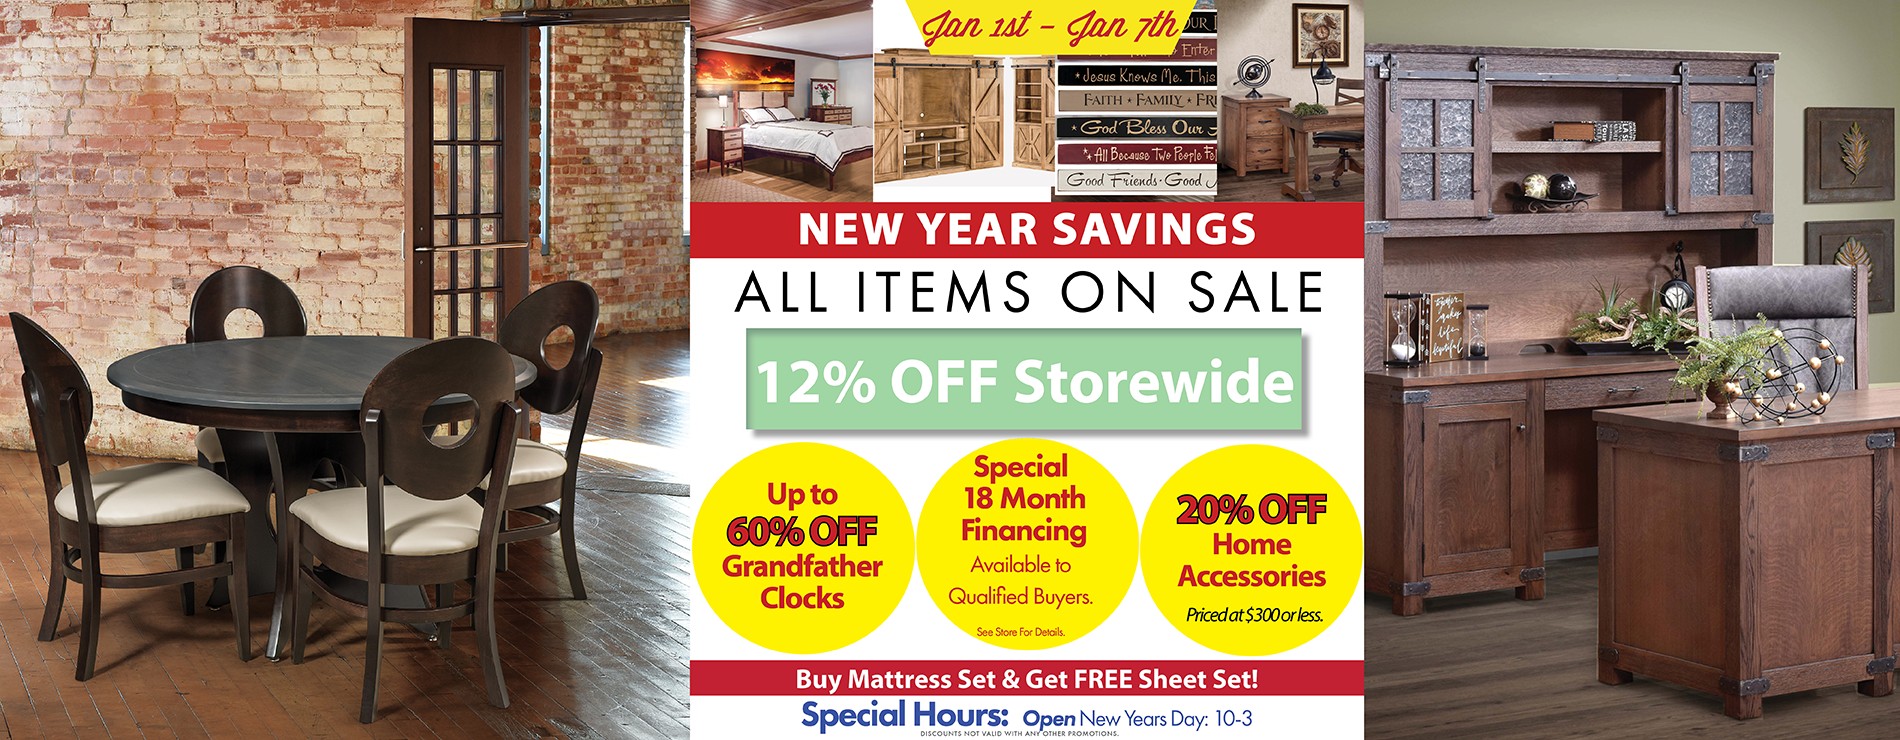 Weaver furniture sales new year savings